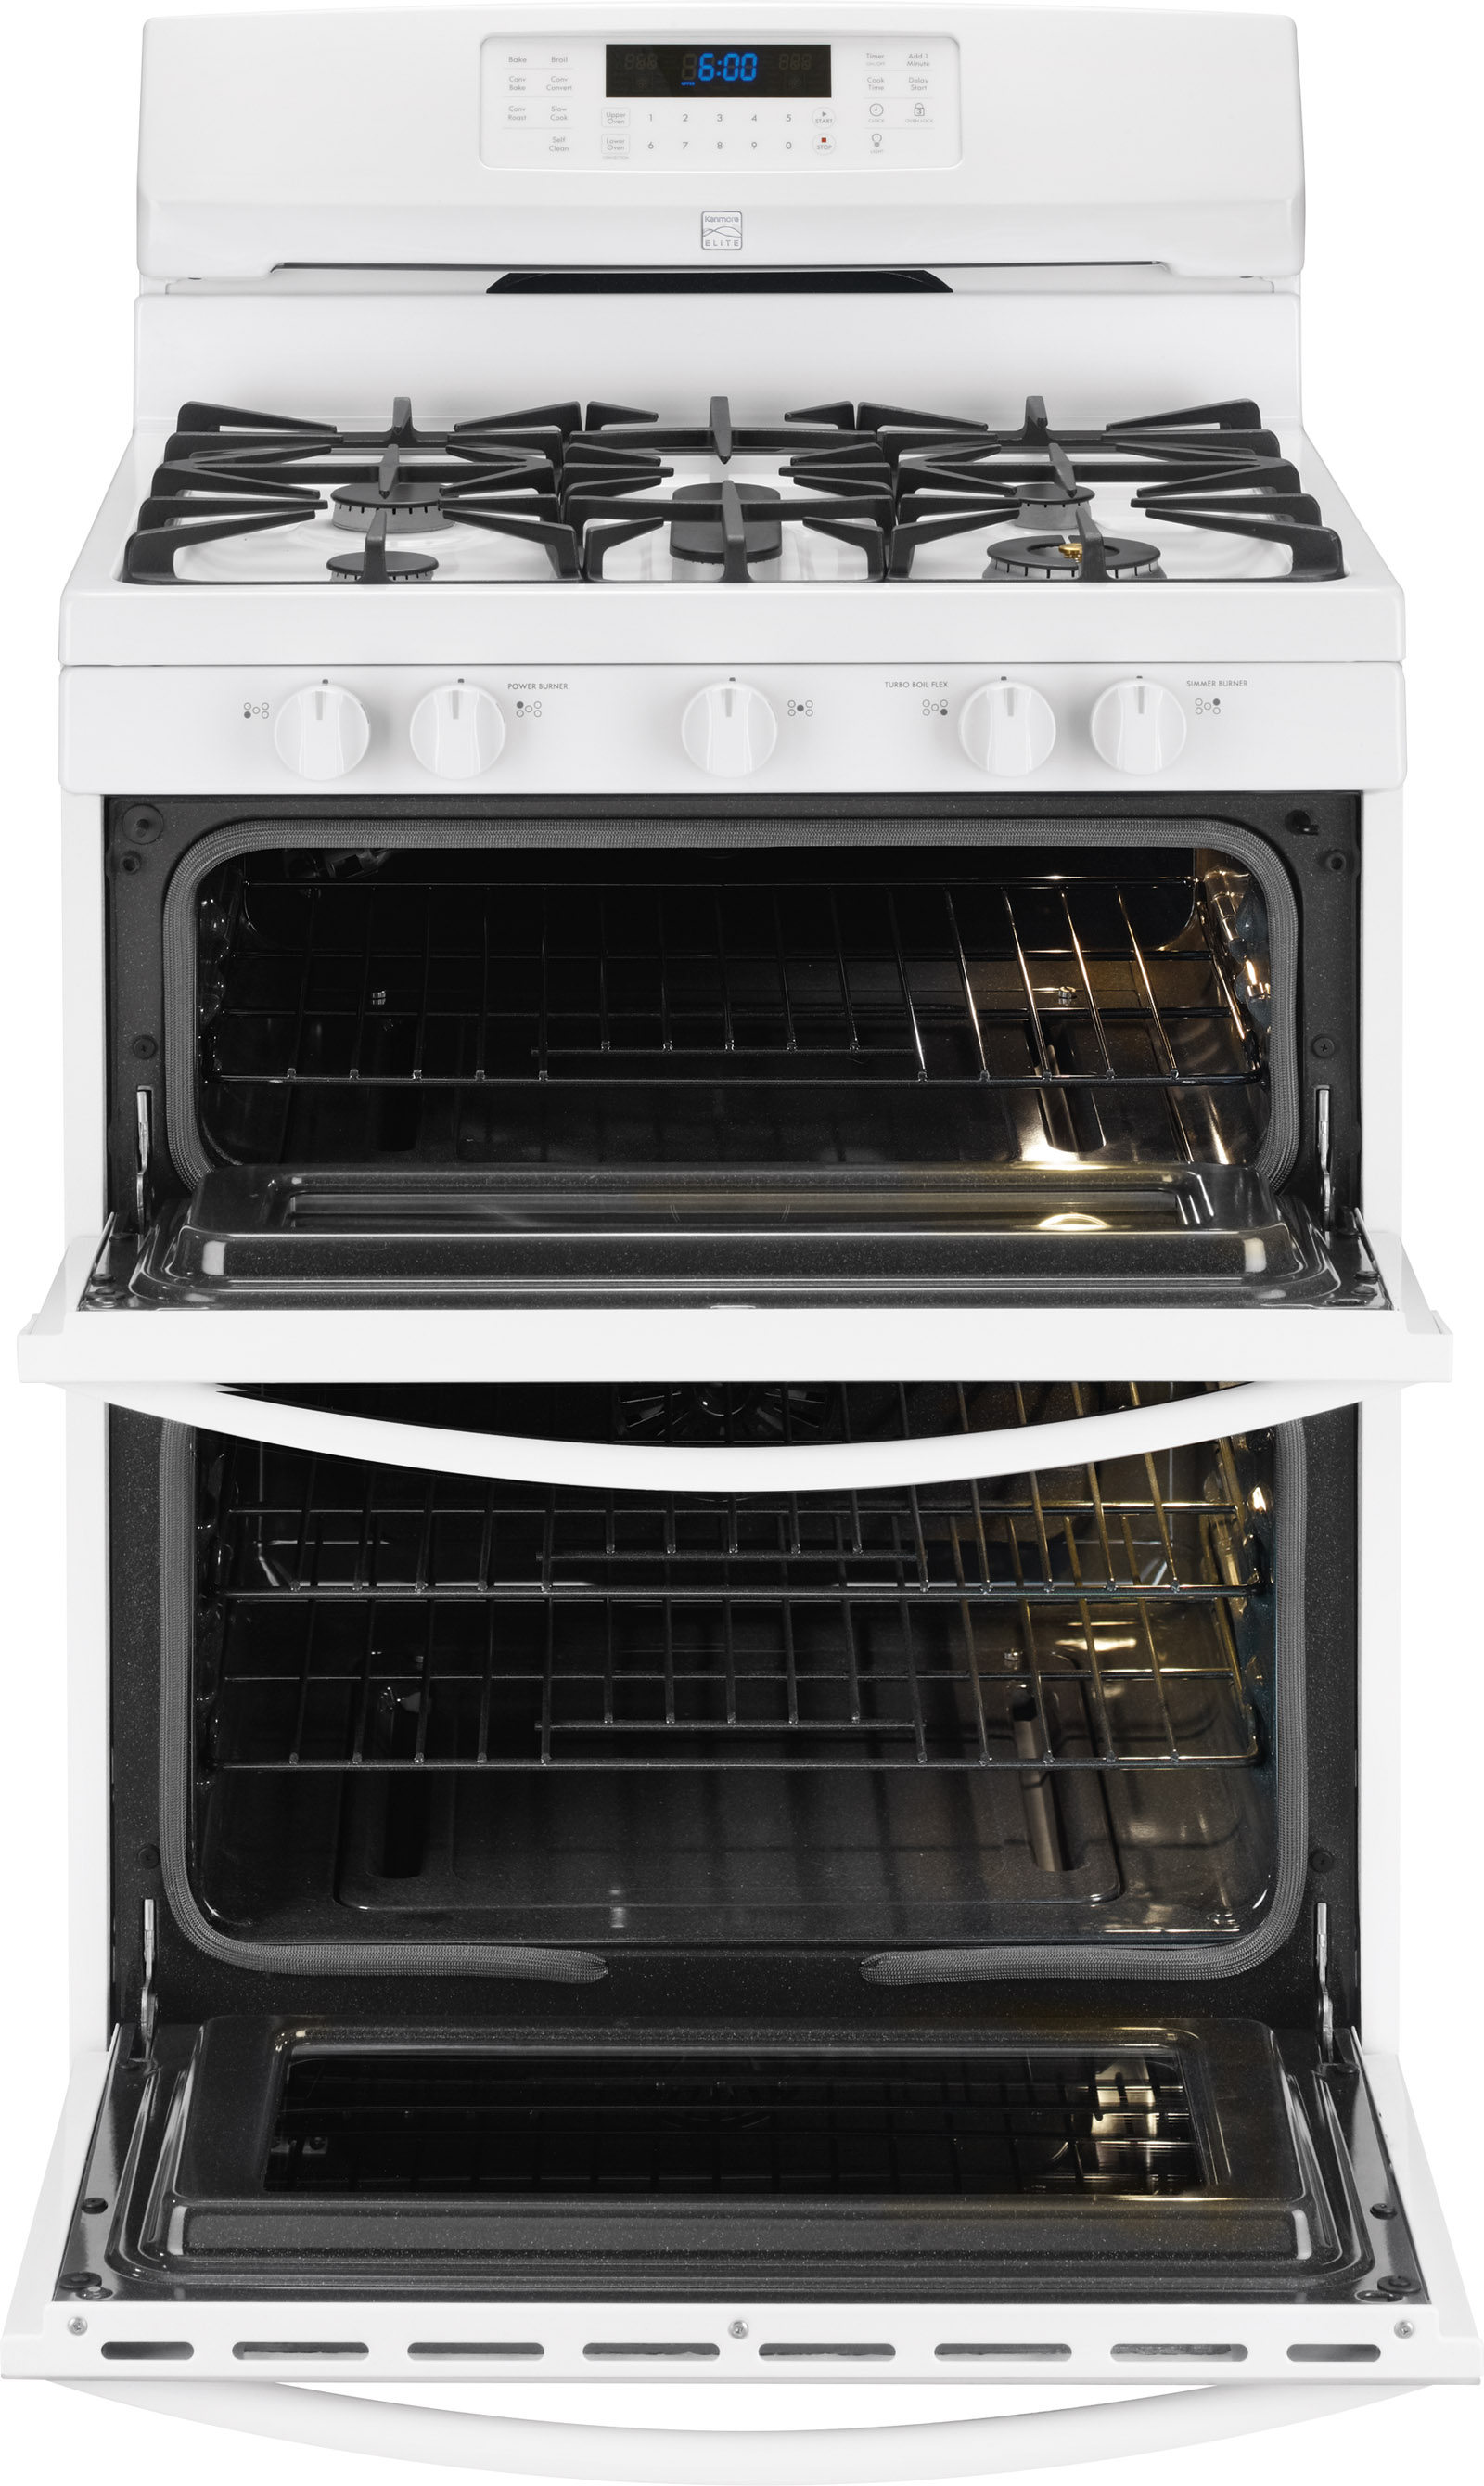 Kenmore Elite 75422 5.9 cu. ft. Double-Oven Gas Range - White